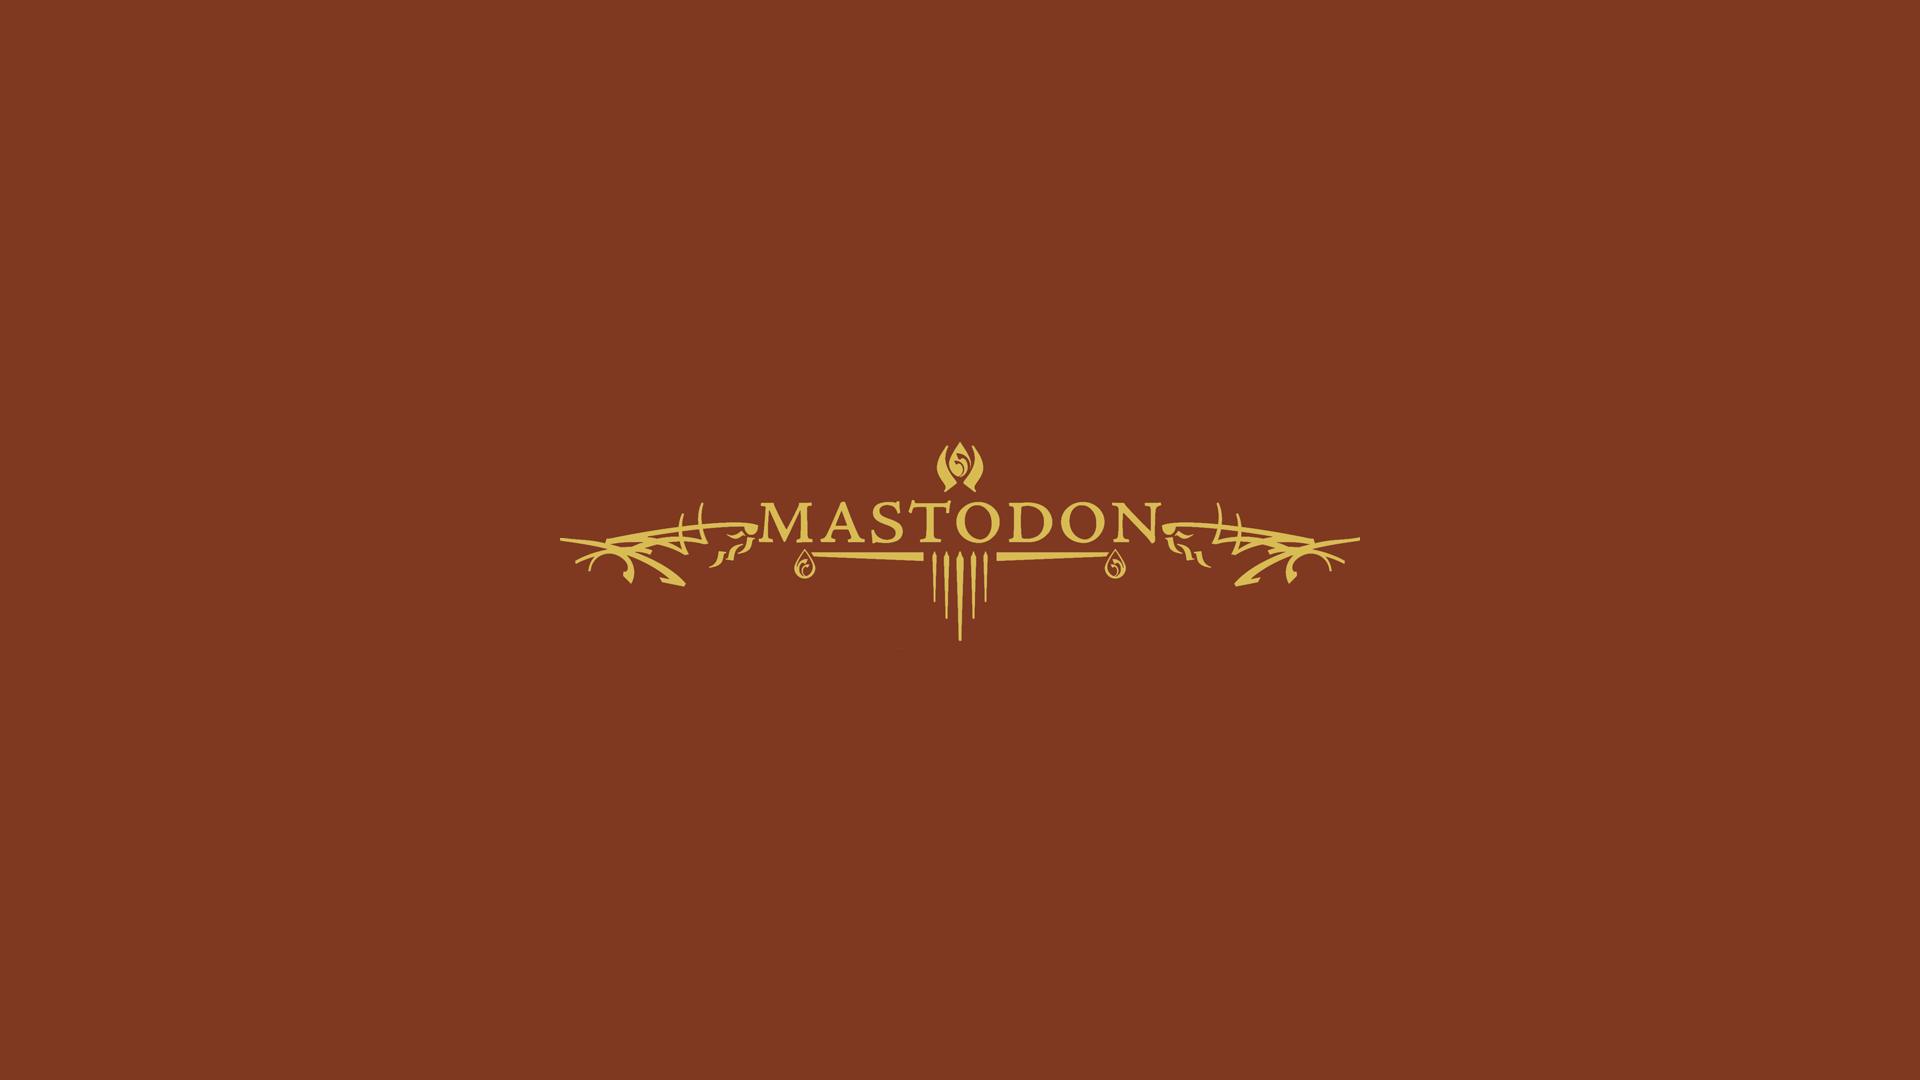 Mastodon Wallpaper